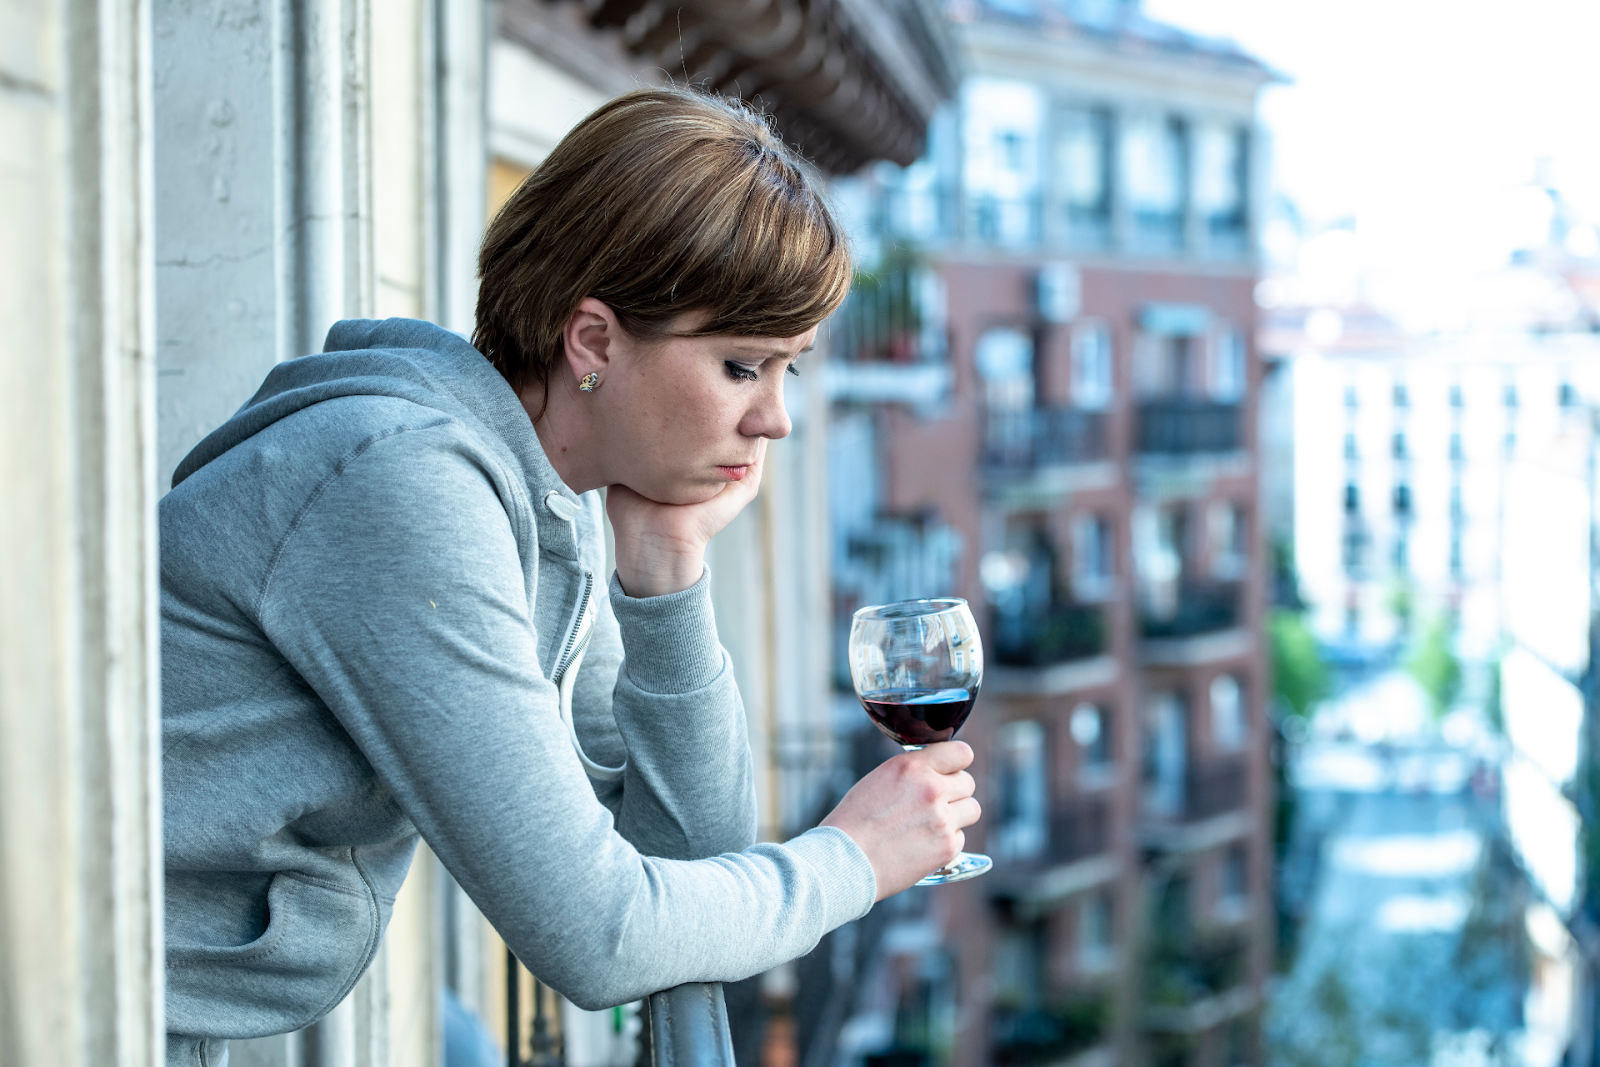 depressed woman drinking wine